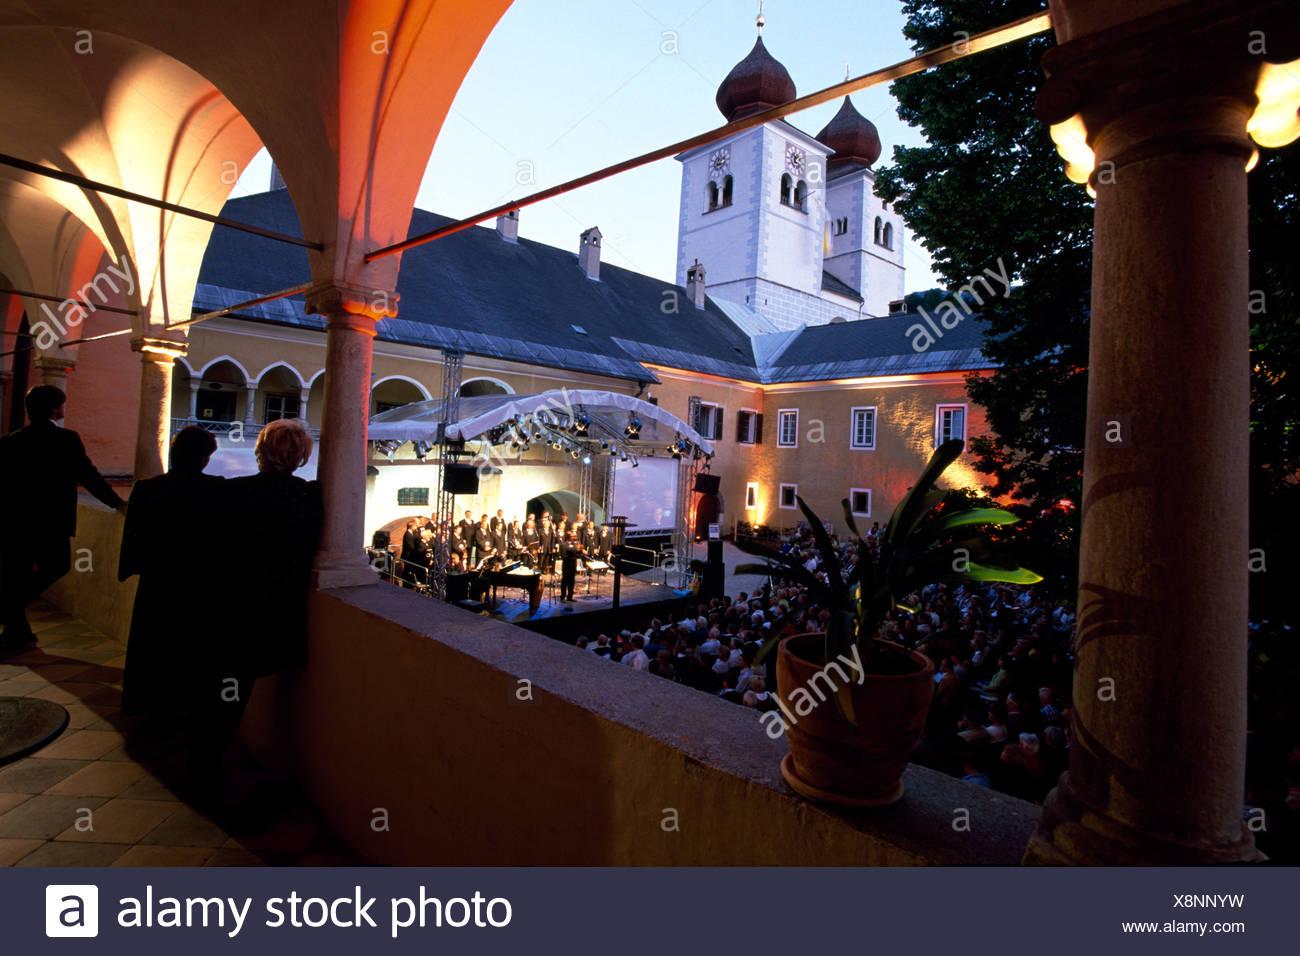 Carinthia Choir, Millstatt, Milstatt Lake, Carinthia, Austria, Europe - Stock Image